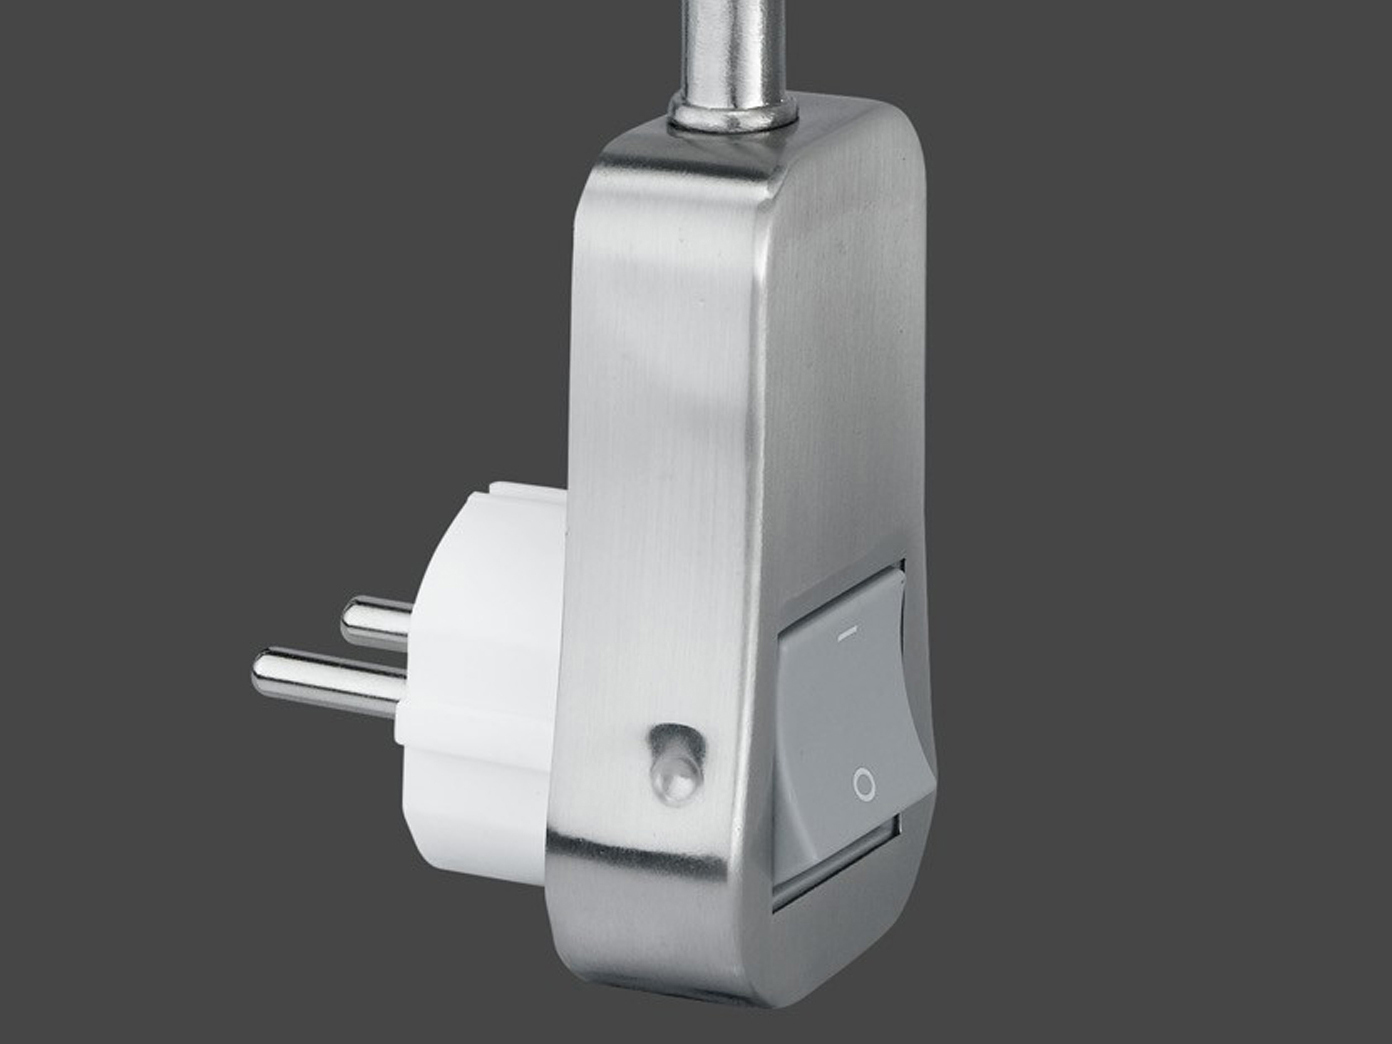 Schalter+Flexarm Kunststoffschirm weiss TRIO Stecker-Spot 1 x E14